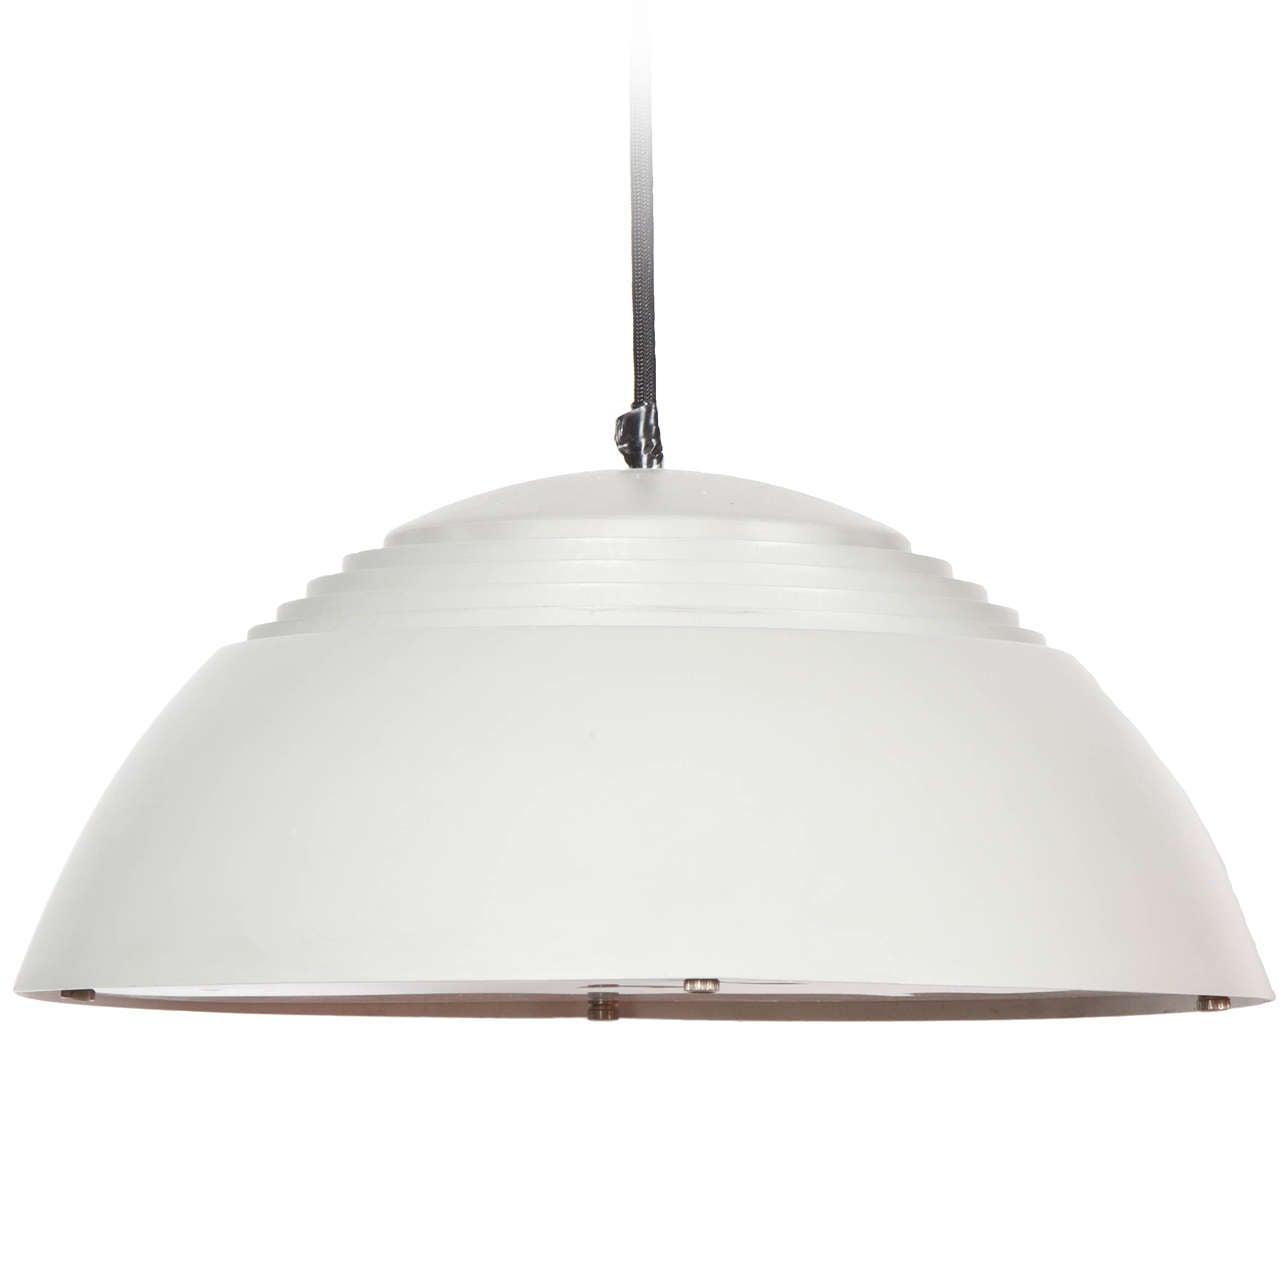 Royal Lamp by Arne Jacobsen for Louis Poulsen at 1stdibs